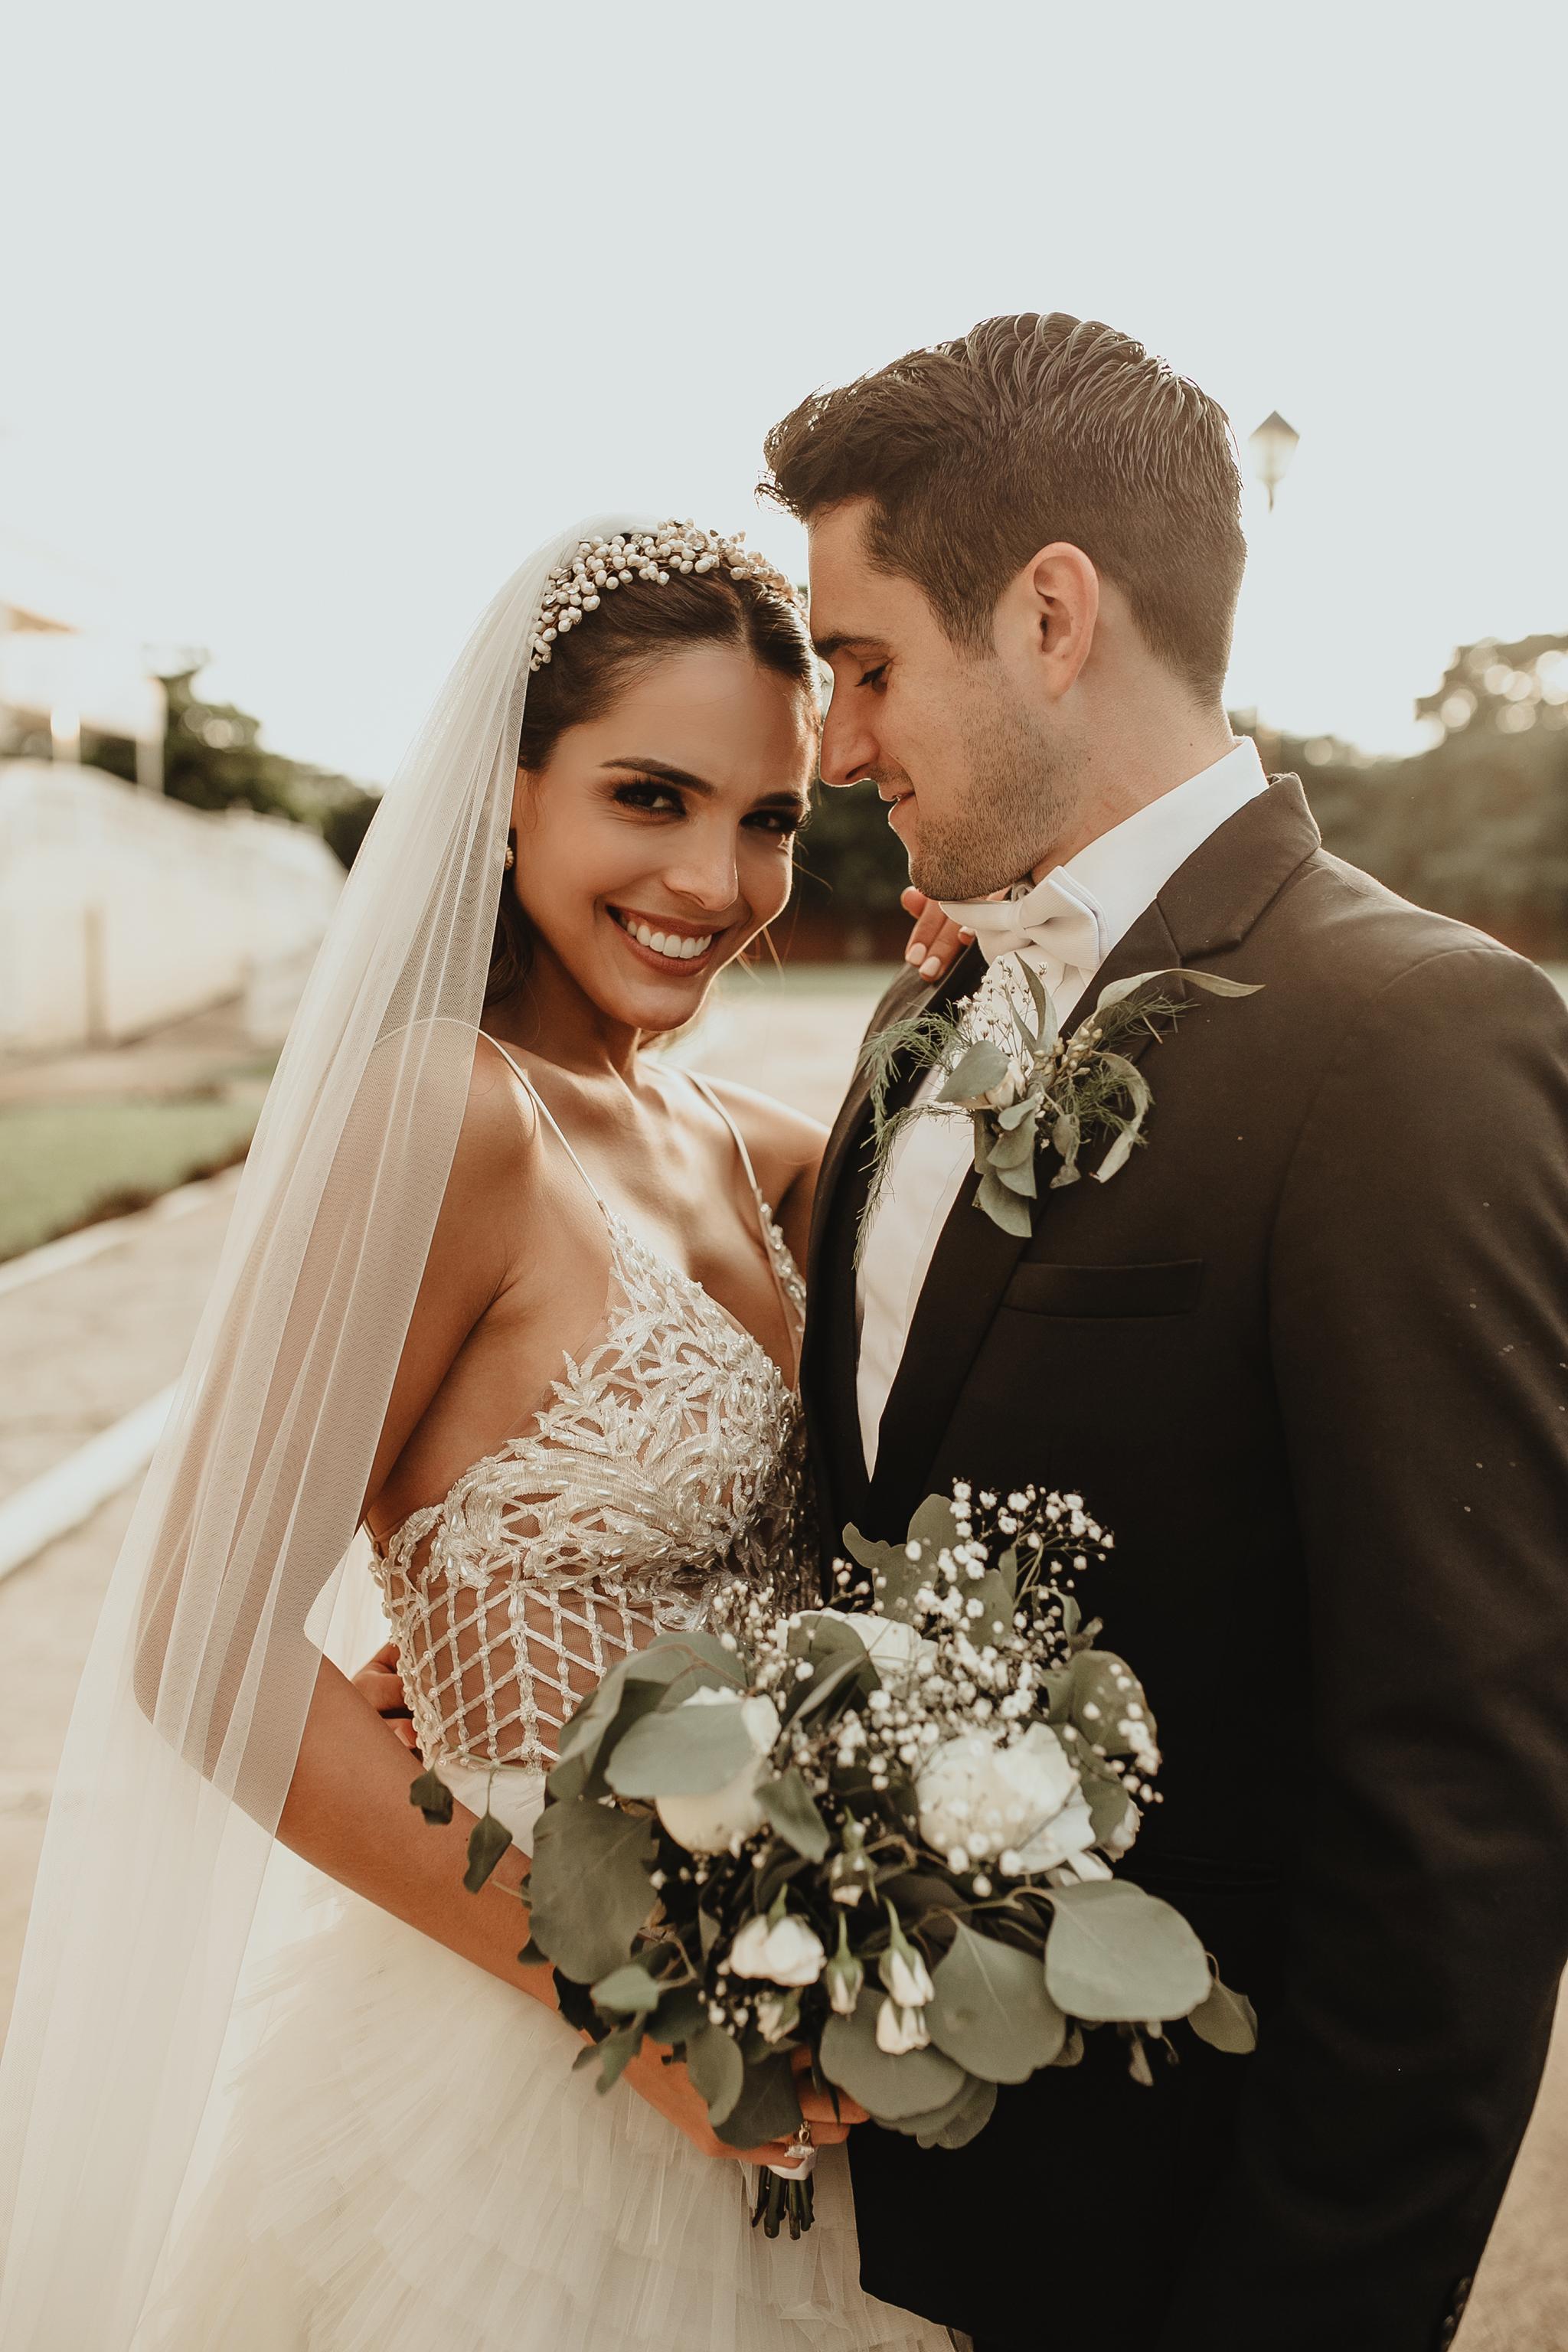 0809R&F__WeddingDestination_Weddingmerida_BodaMexico_FotografoDeBodas_FabrizioSimoneenFotografo.jpg